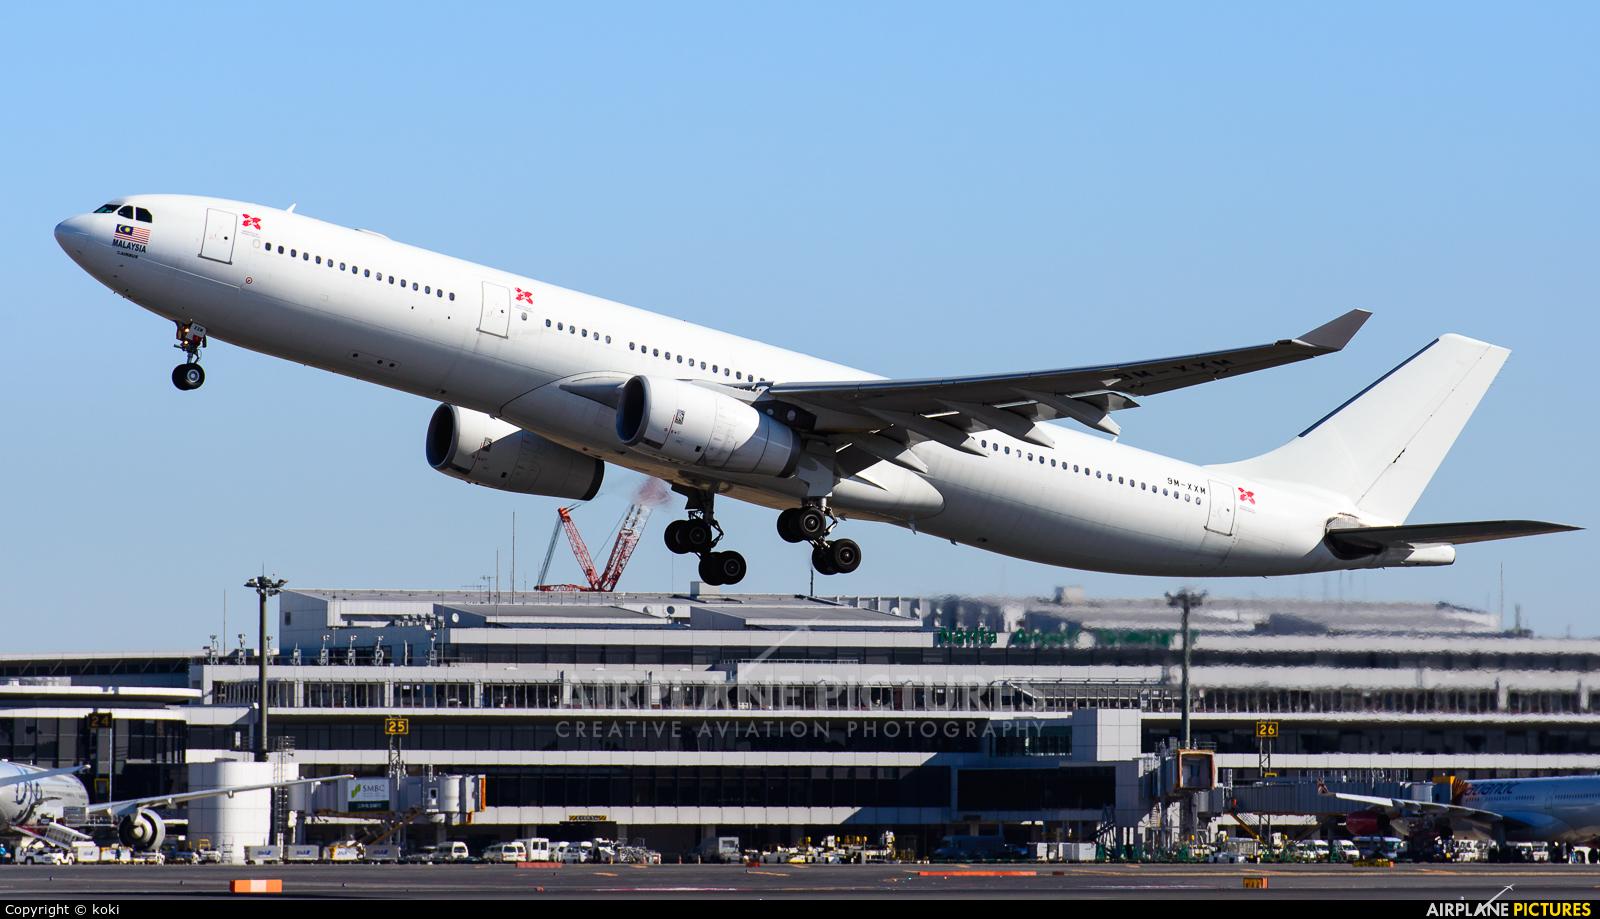 9M-XXM - AirAsia X Airbus A330-300 at Tokyo - Narita Intl ...